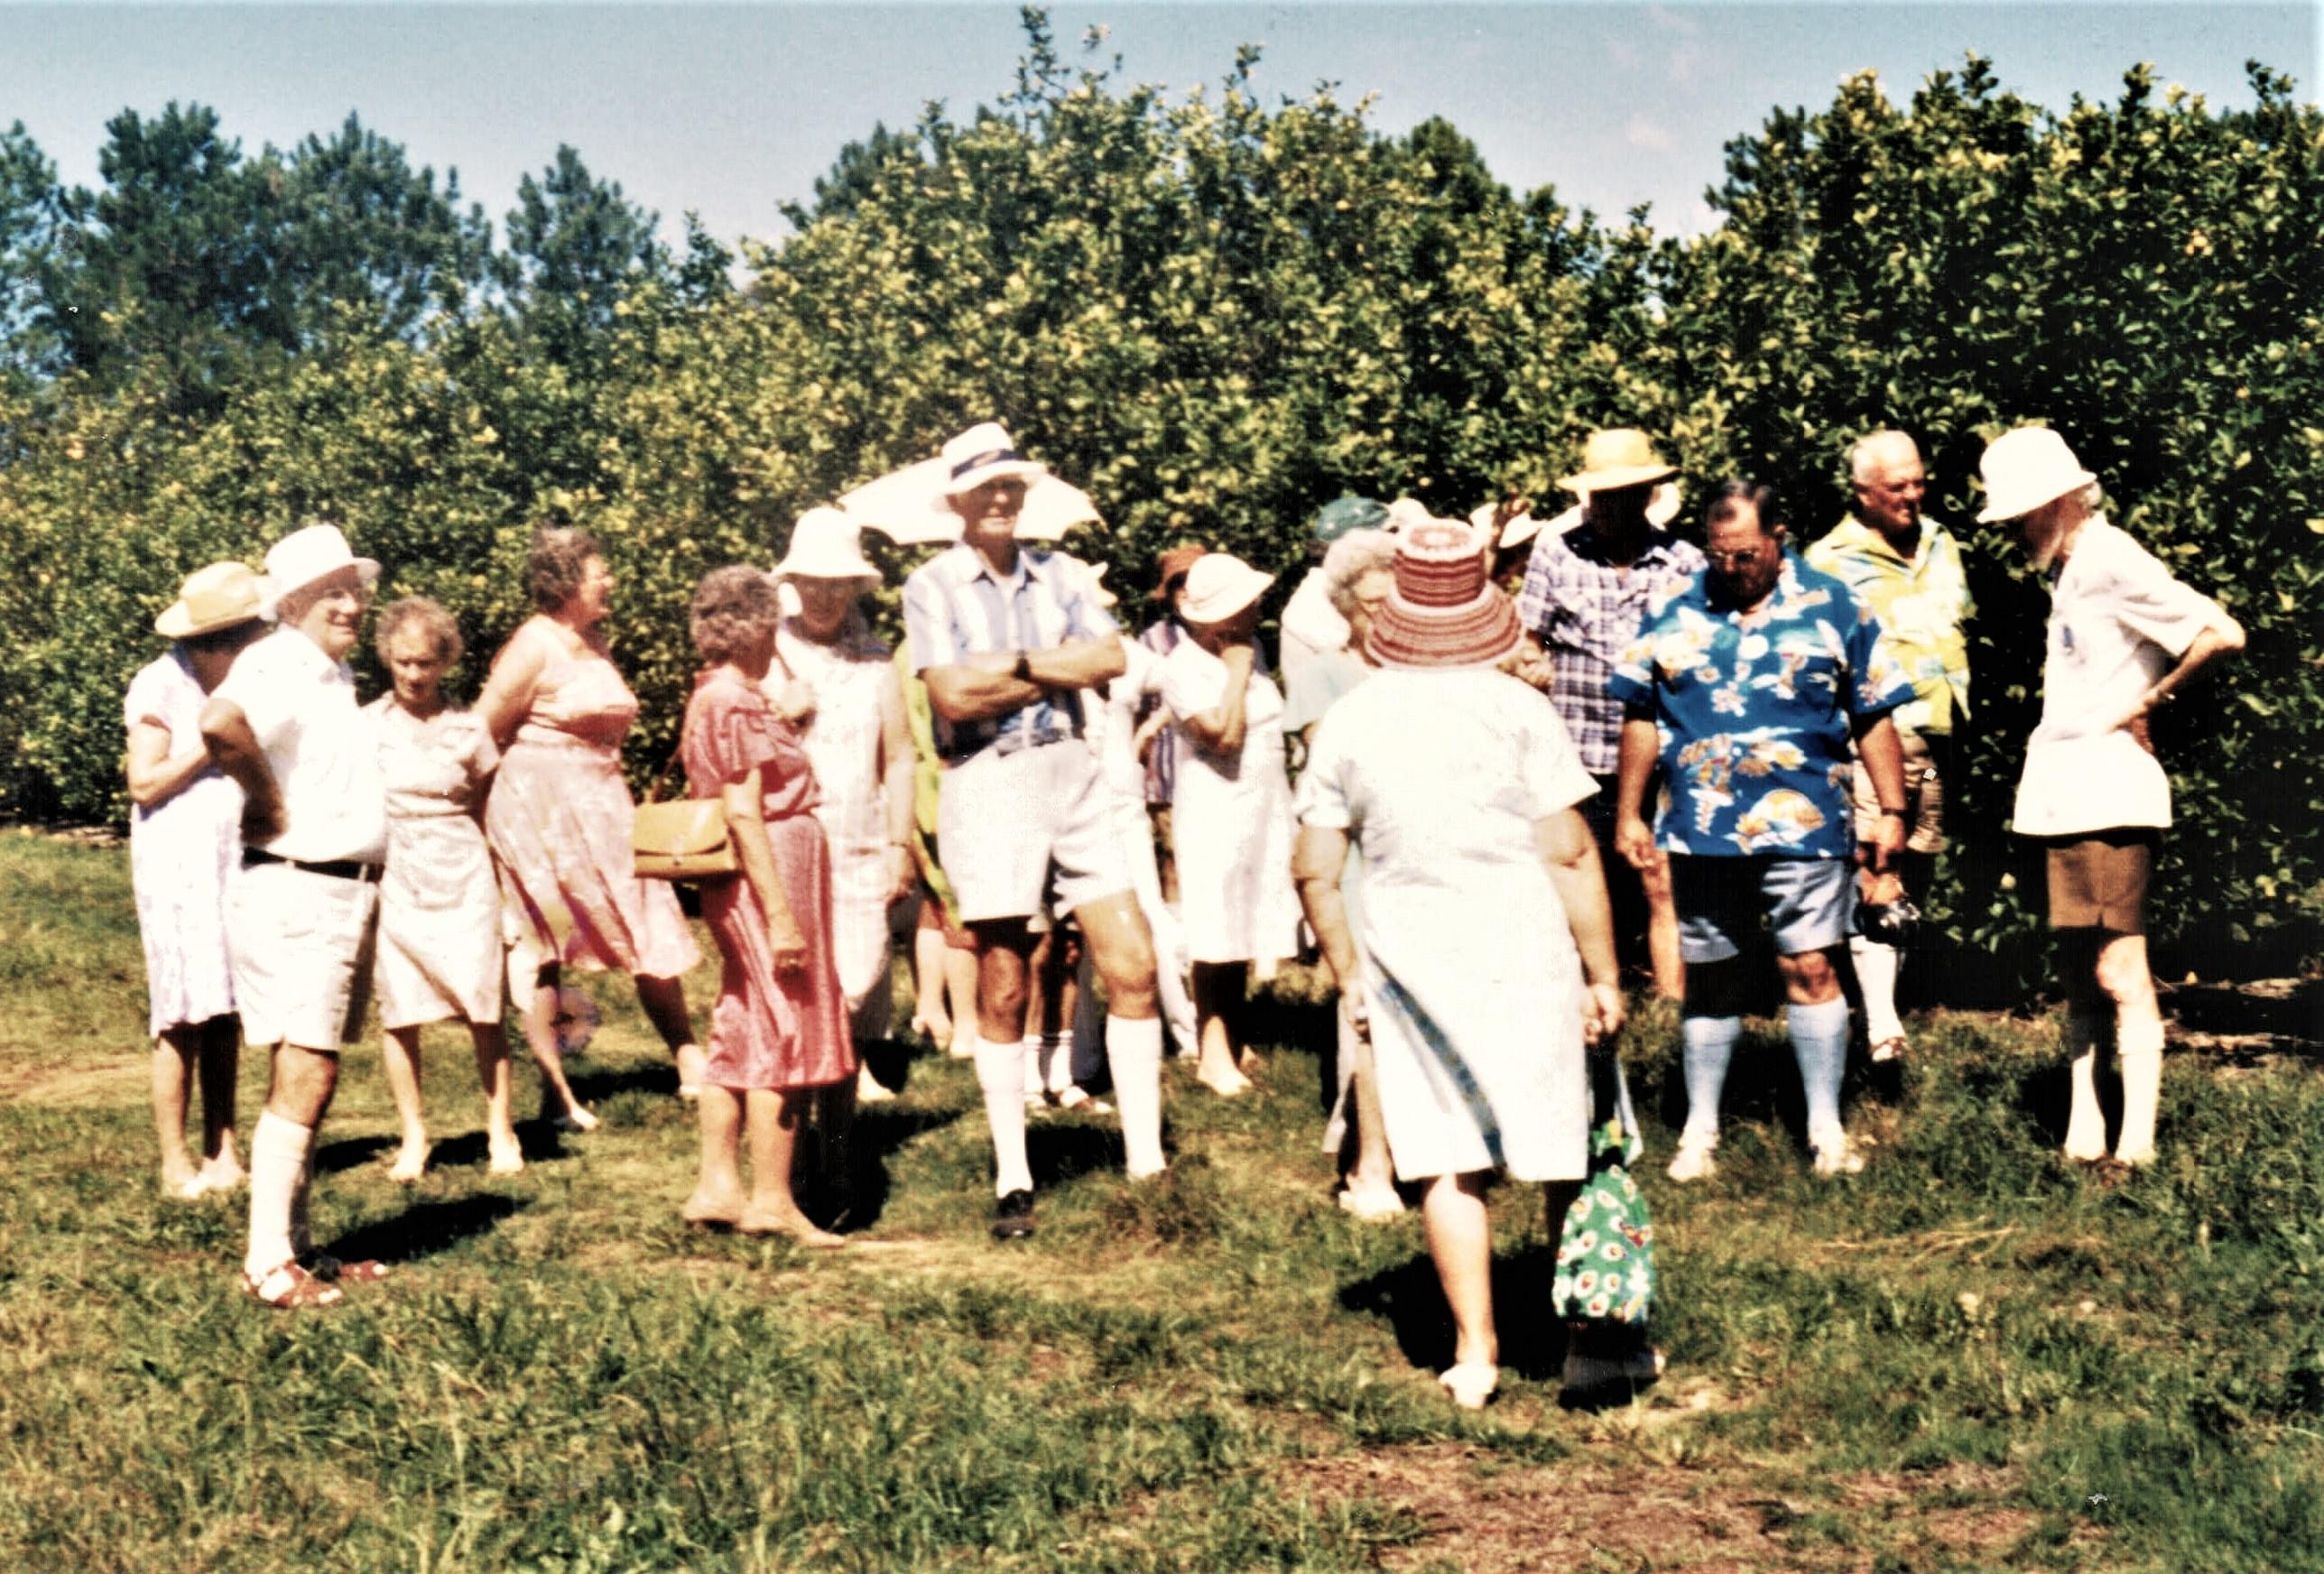 1985 Outings Mangrove Mountain 12-3-85